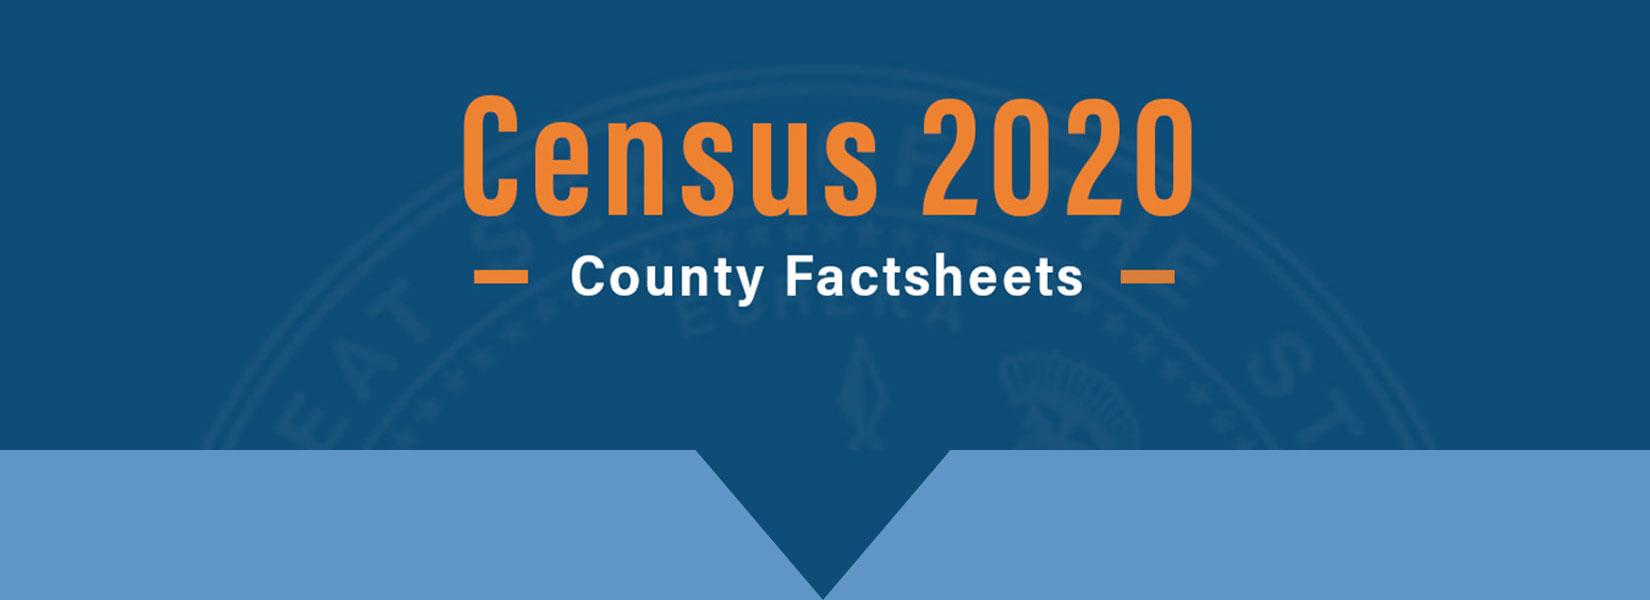 Census 2020 Fact Sheets